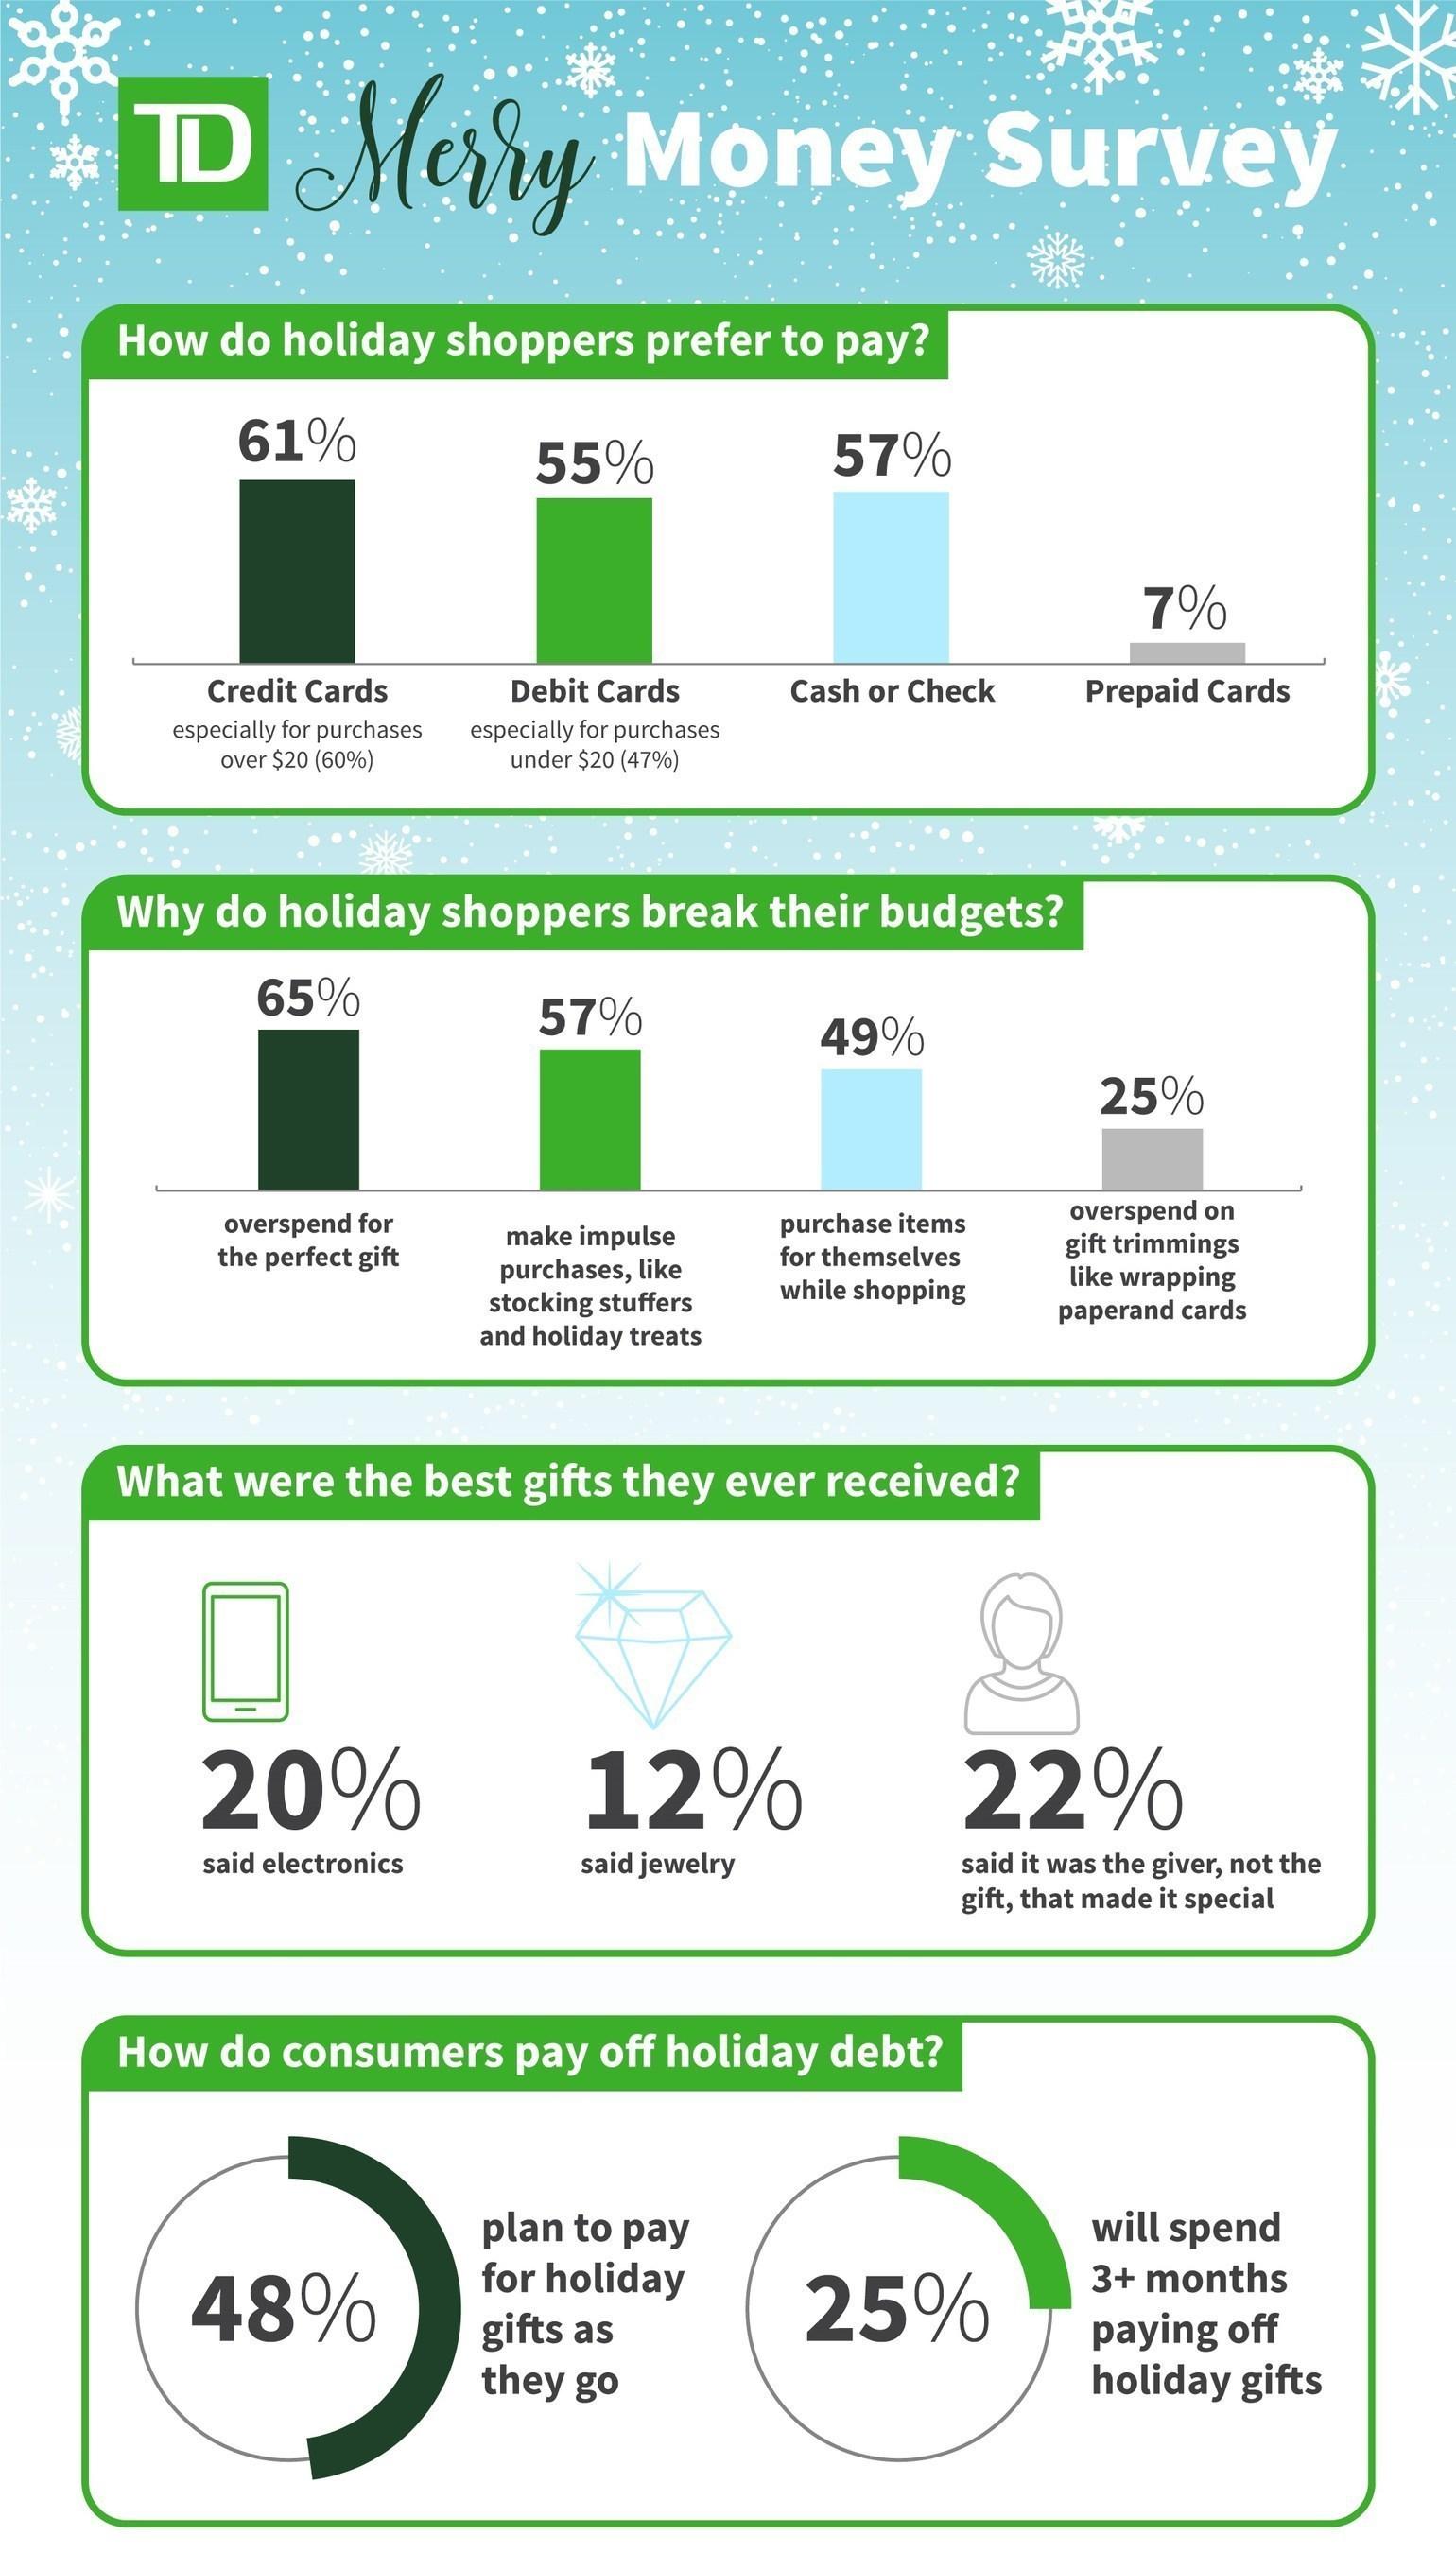 TD Bank Merry Money Survey Infographic